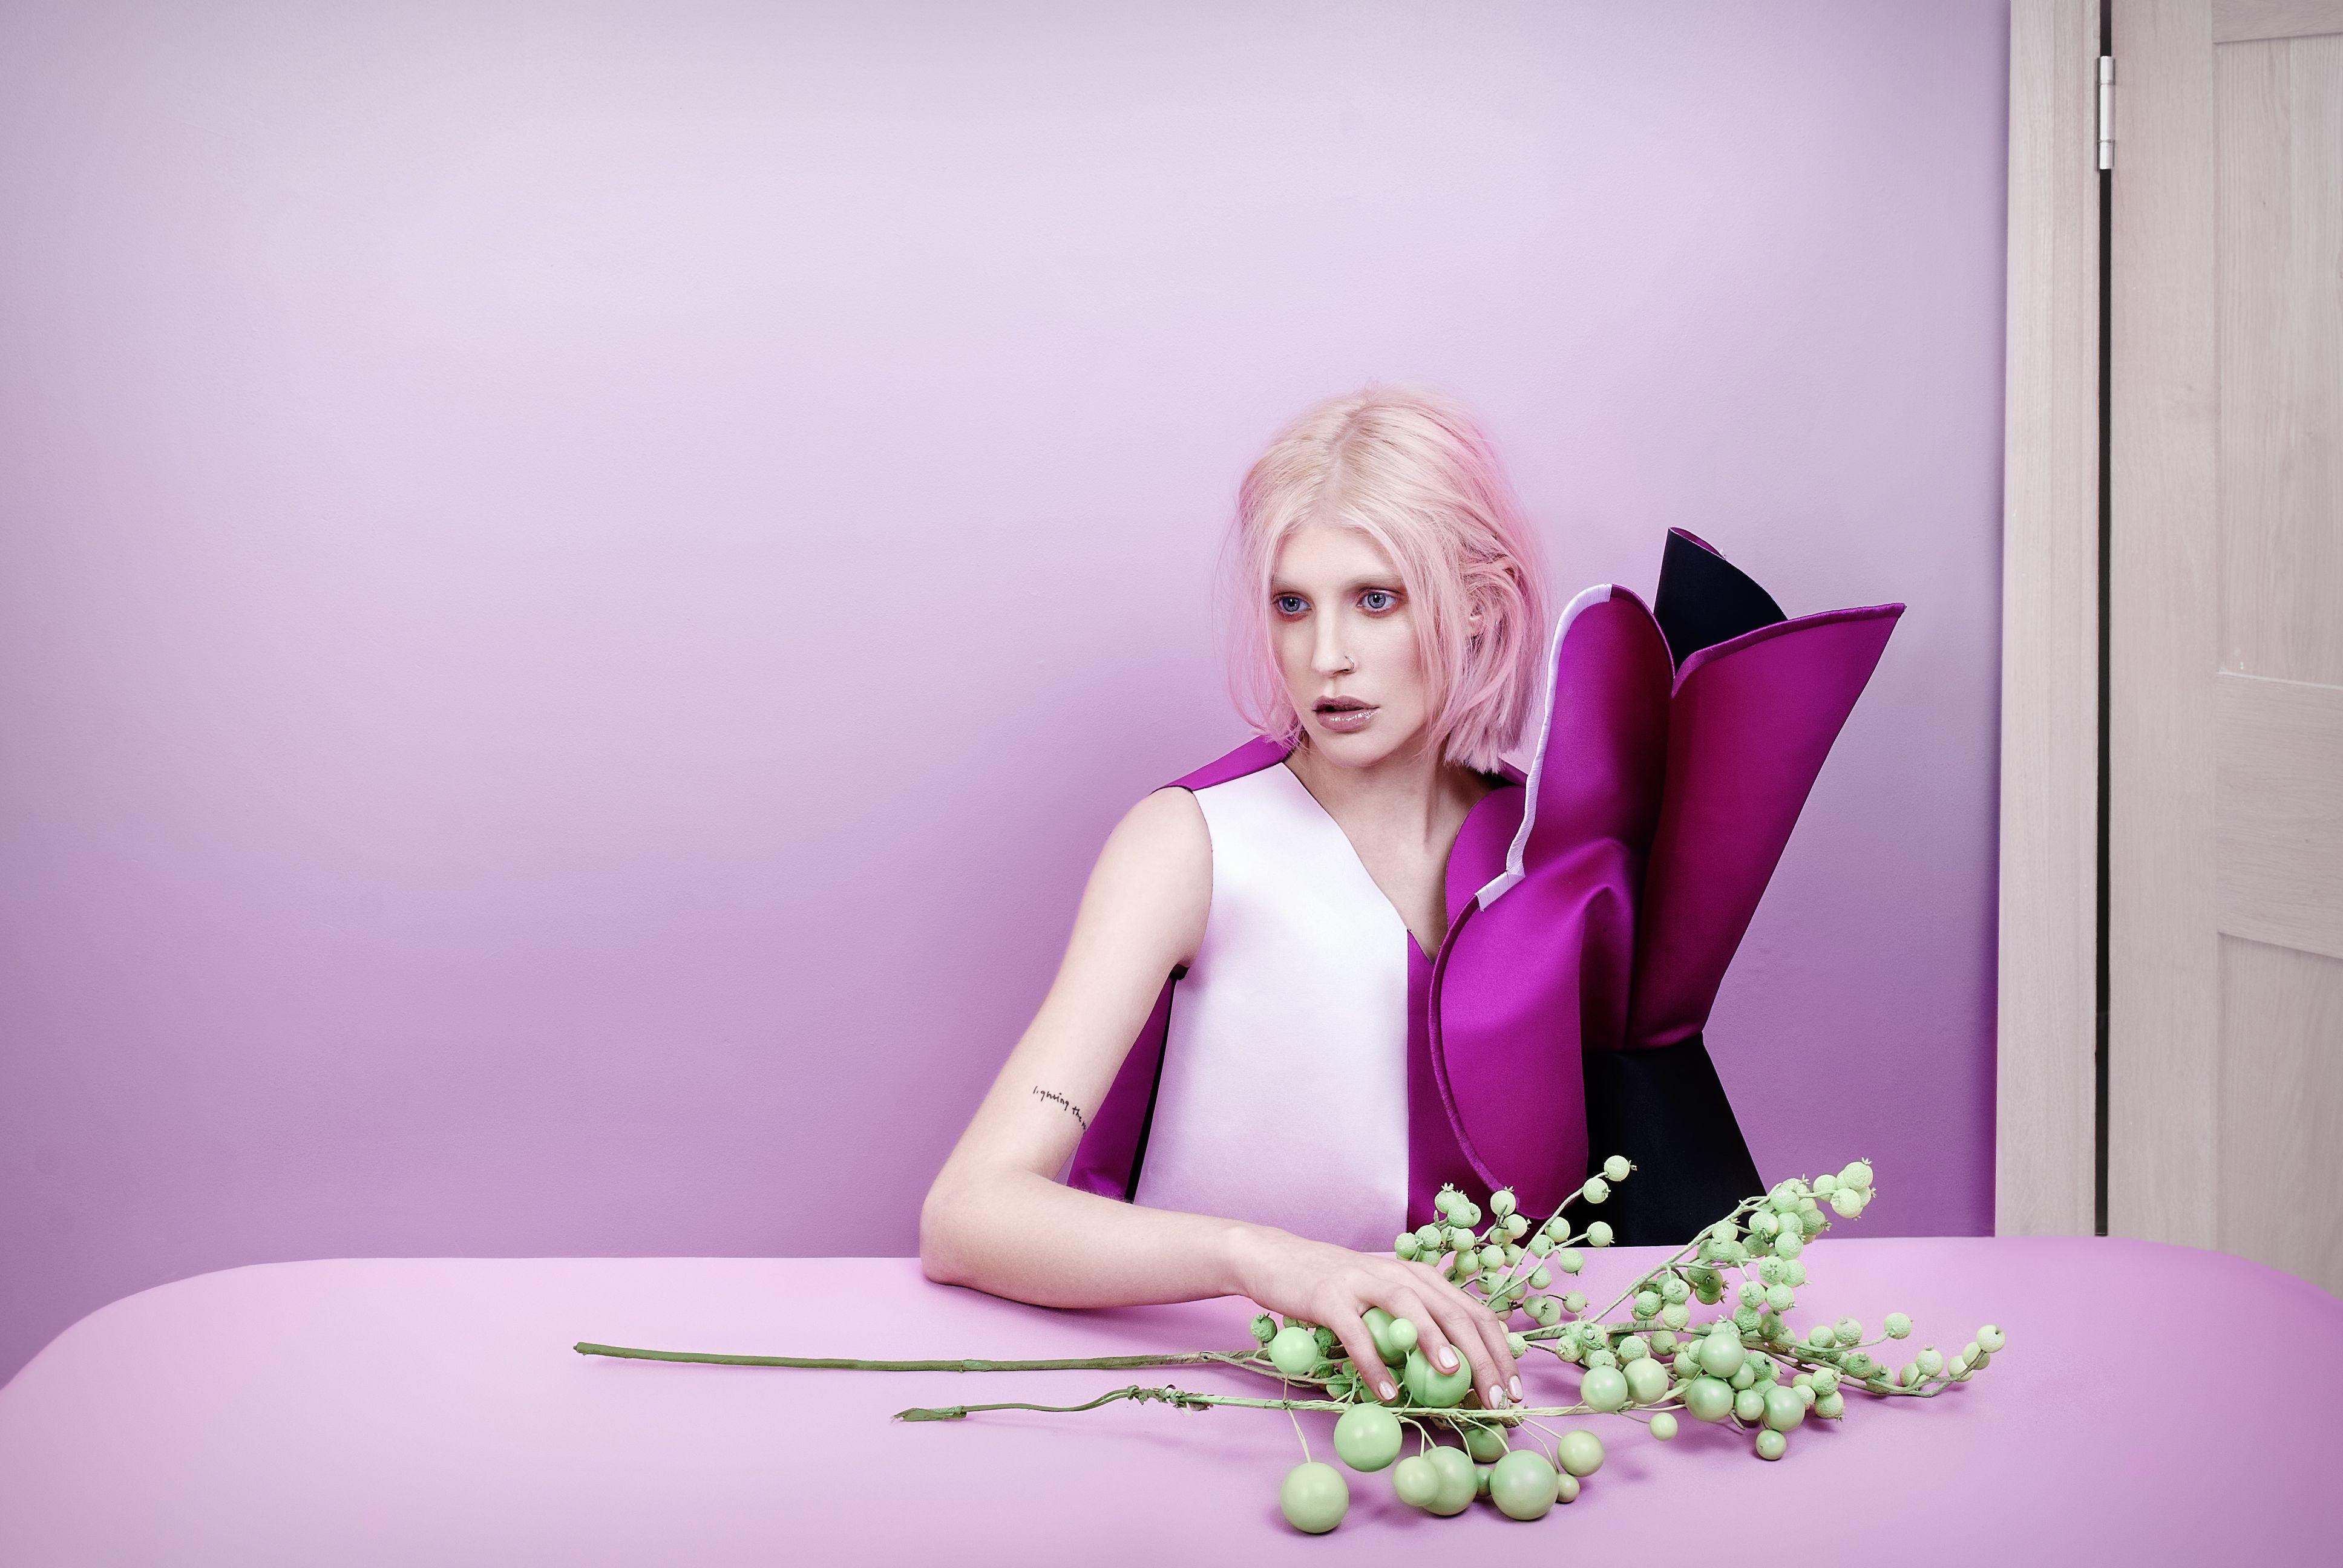 Flowers for fashion editorial. Old Tat Magazine - Issue 2 Photography Tussunee Roadjanarungtong Styling: Carolina Mizrahi. Flowers and props; Yan Skates